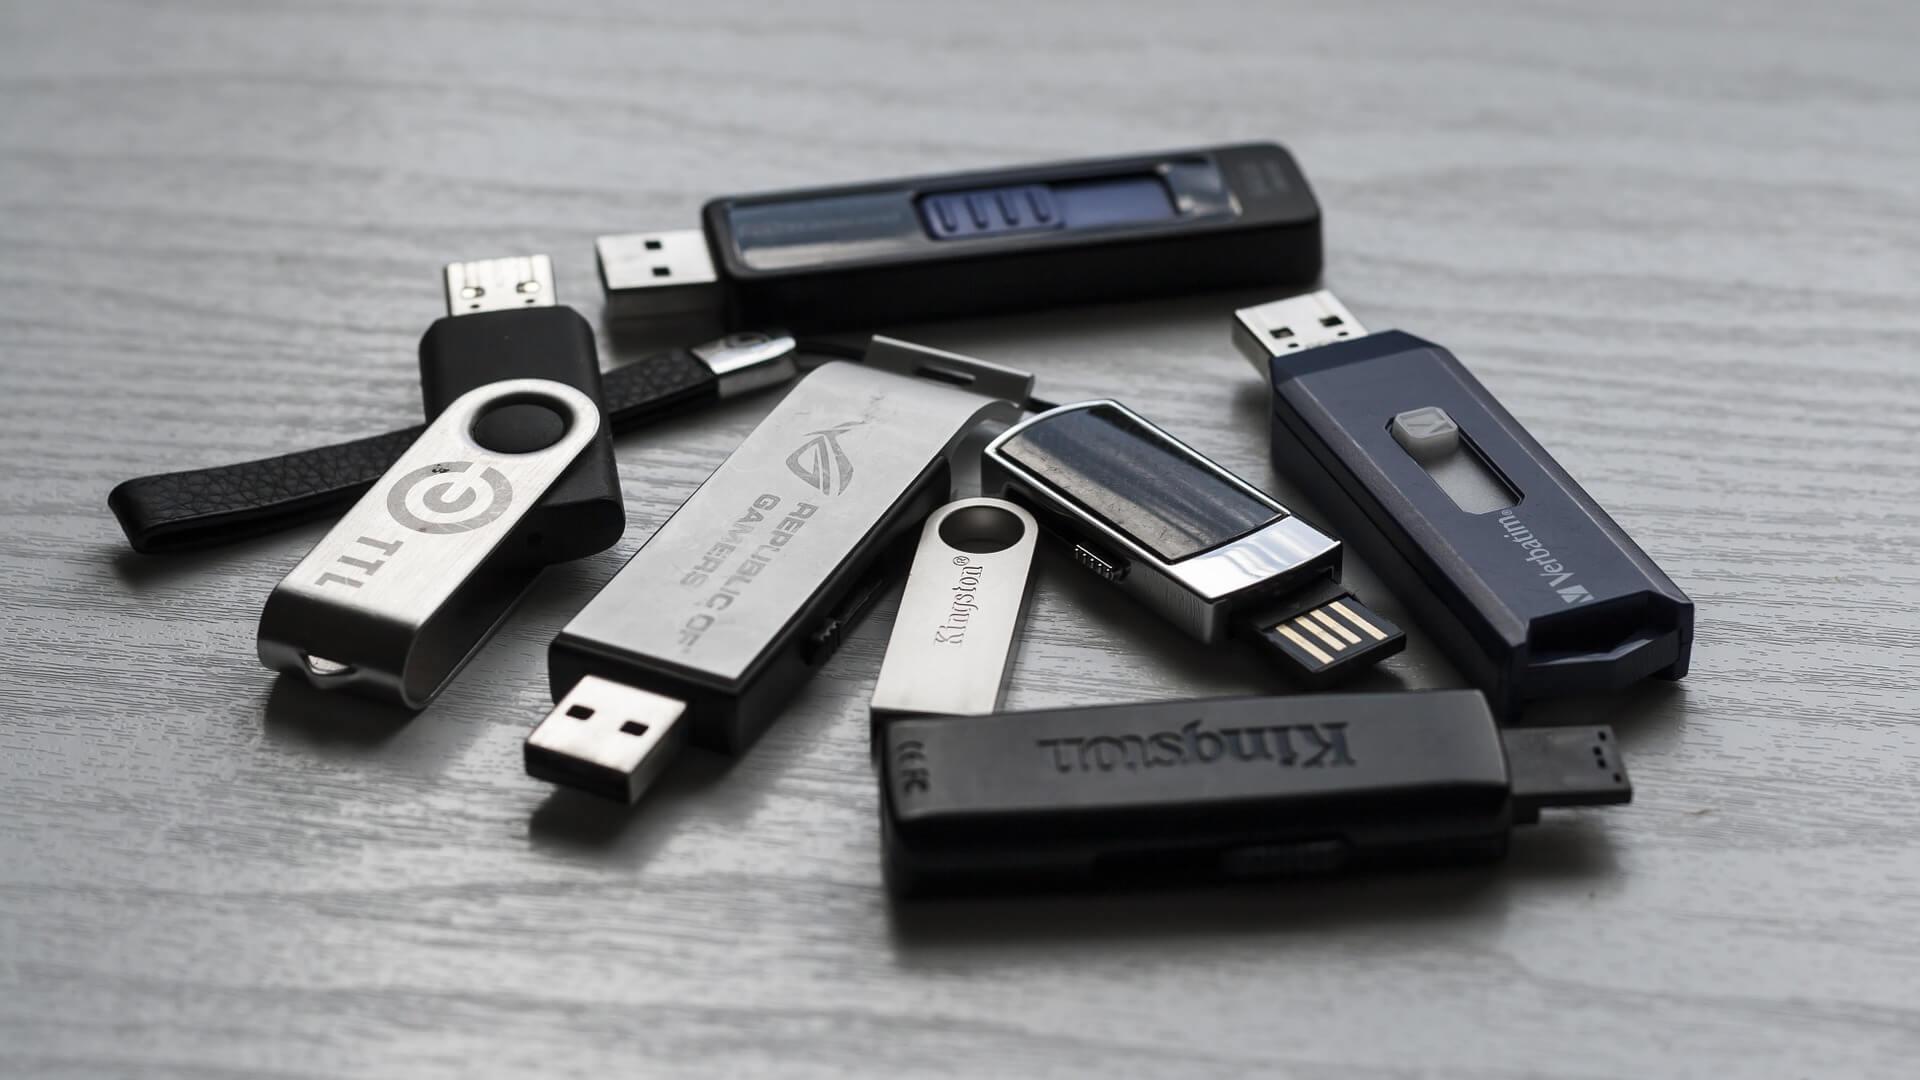 USB-Stick wird nicht erkannt